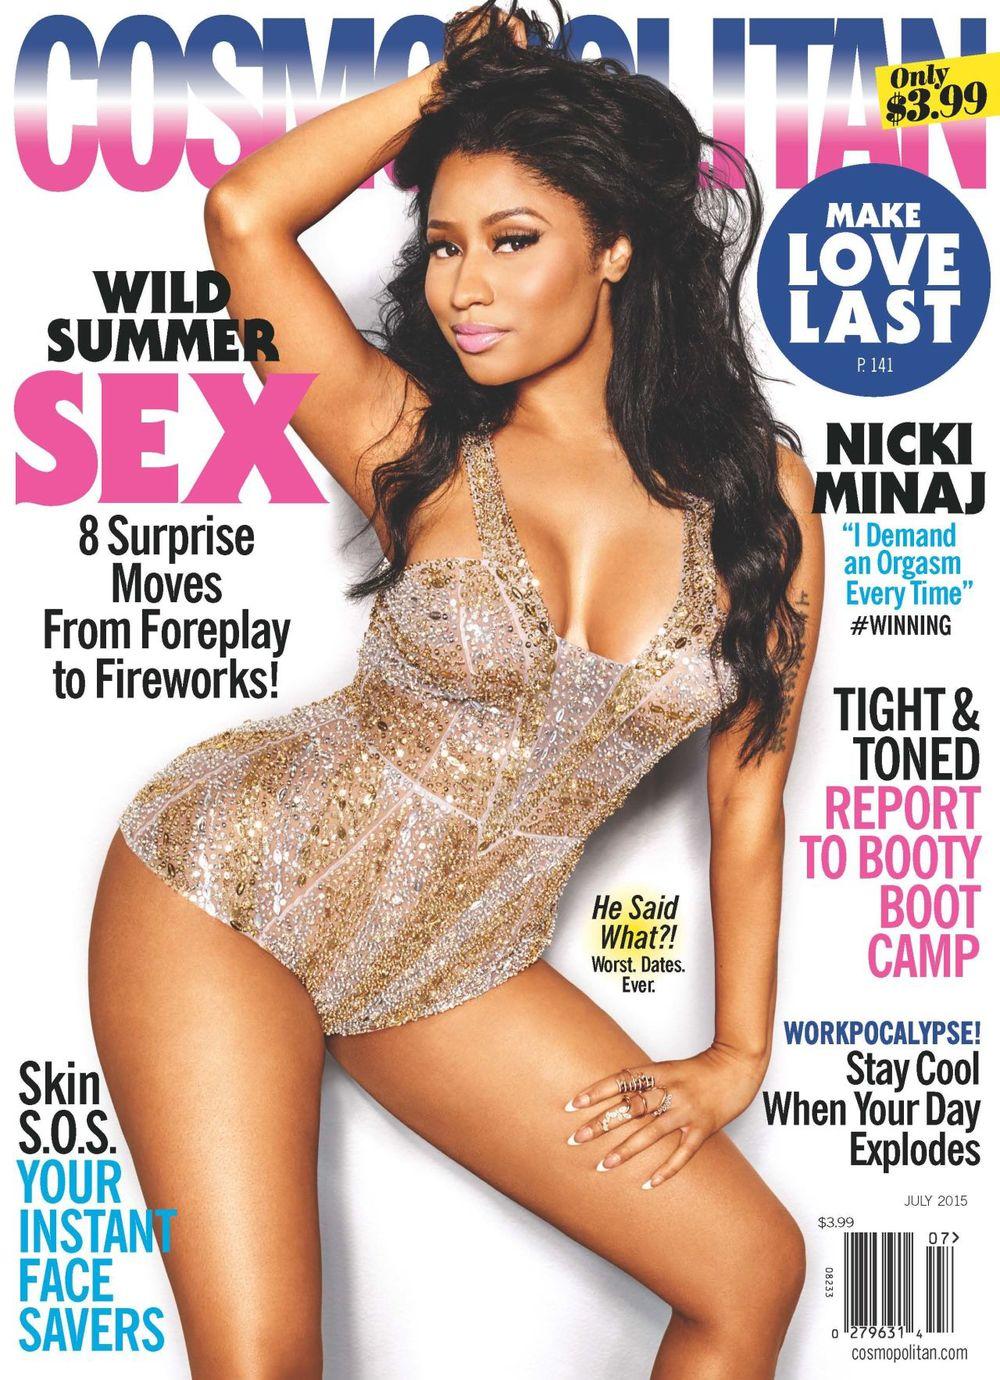 Nicki Minaj Cosmo July 2015